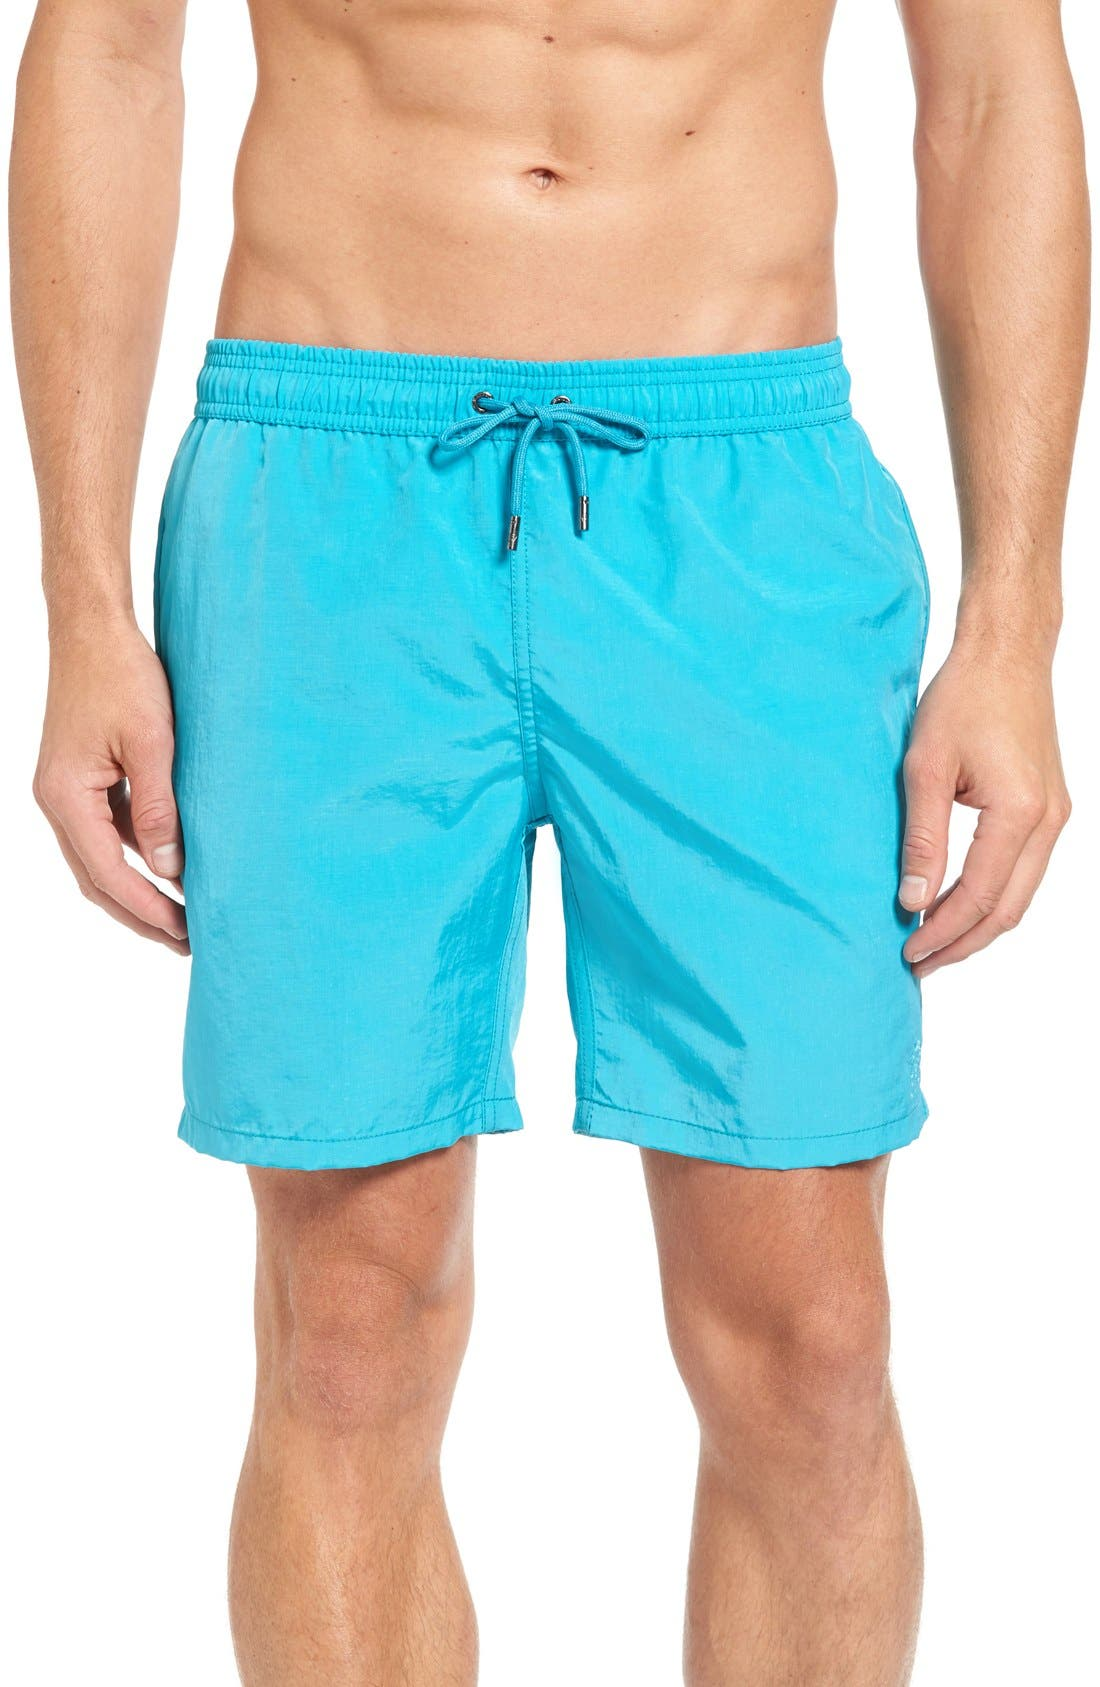 Alternate Image 1 Selected - Mr.Swim Cerulean Solid Swim Trunks